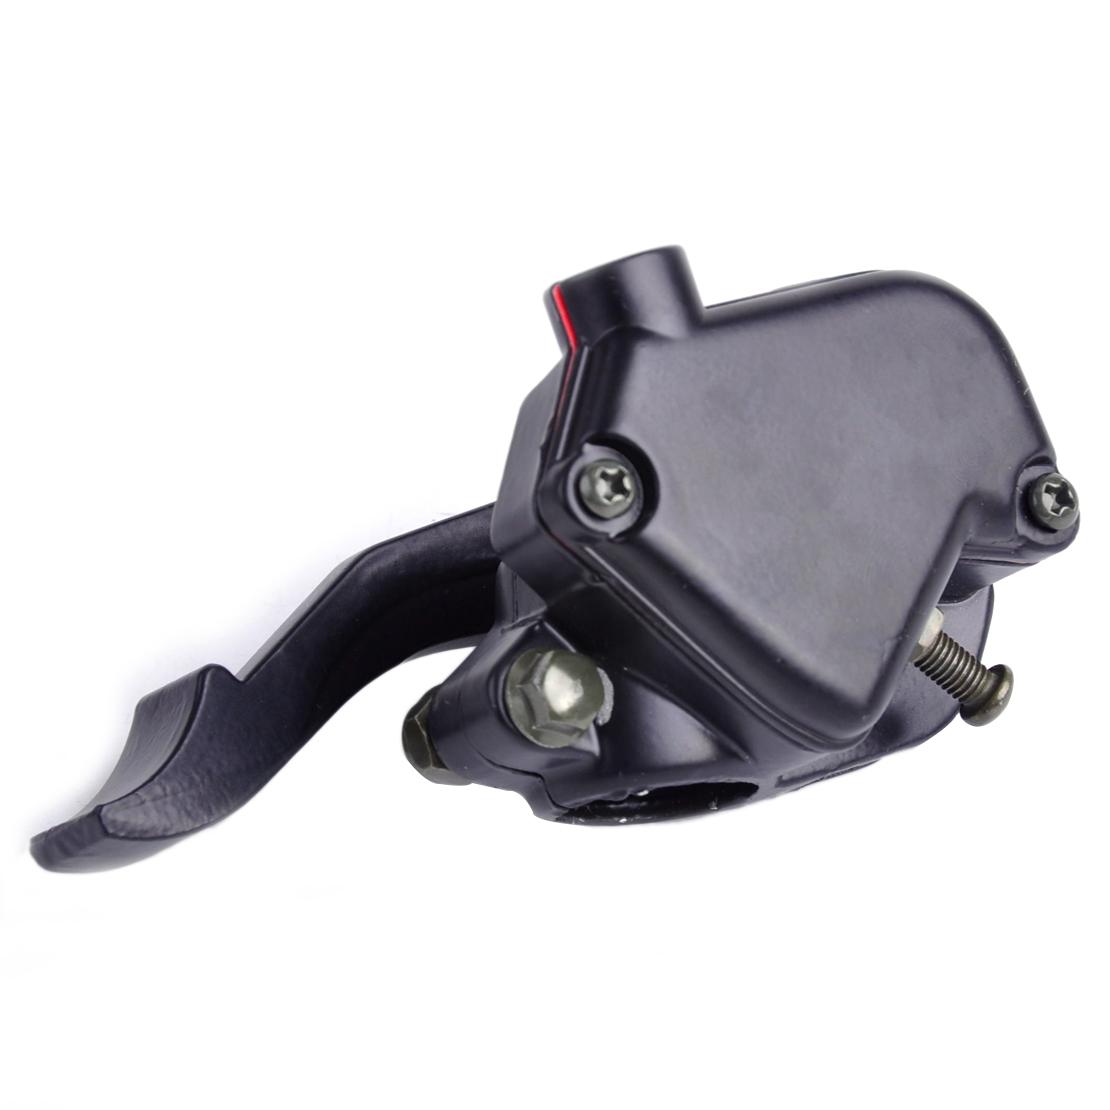 Atv Throttle Lever : Thumb accelerator brake lever throttle cable fit for atv